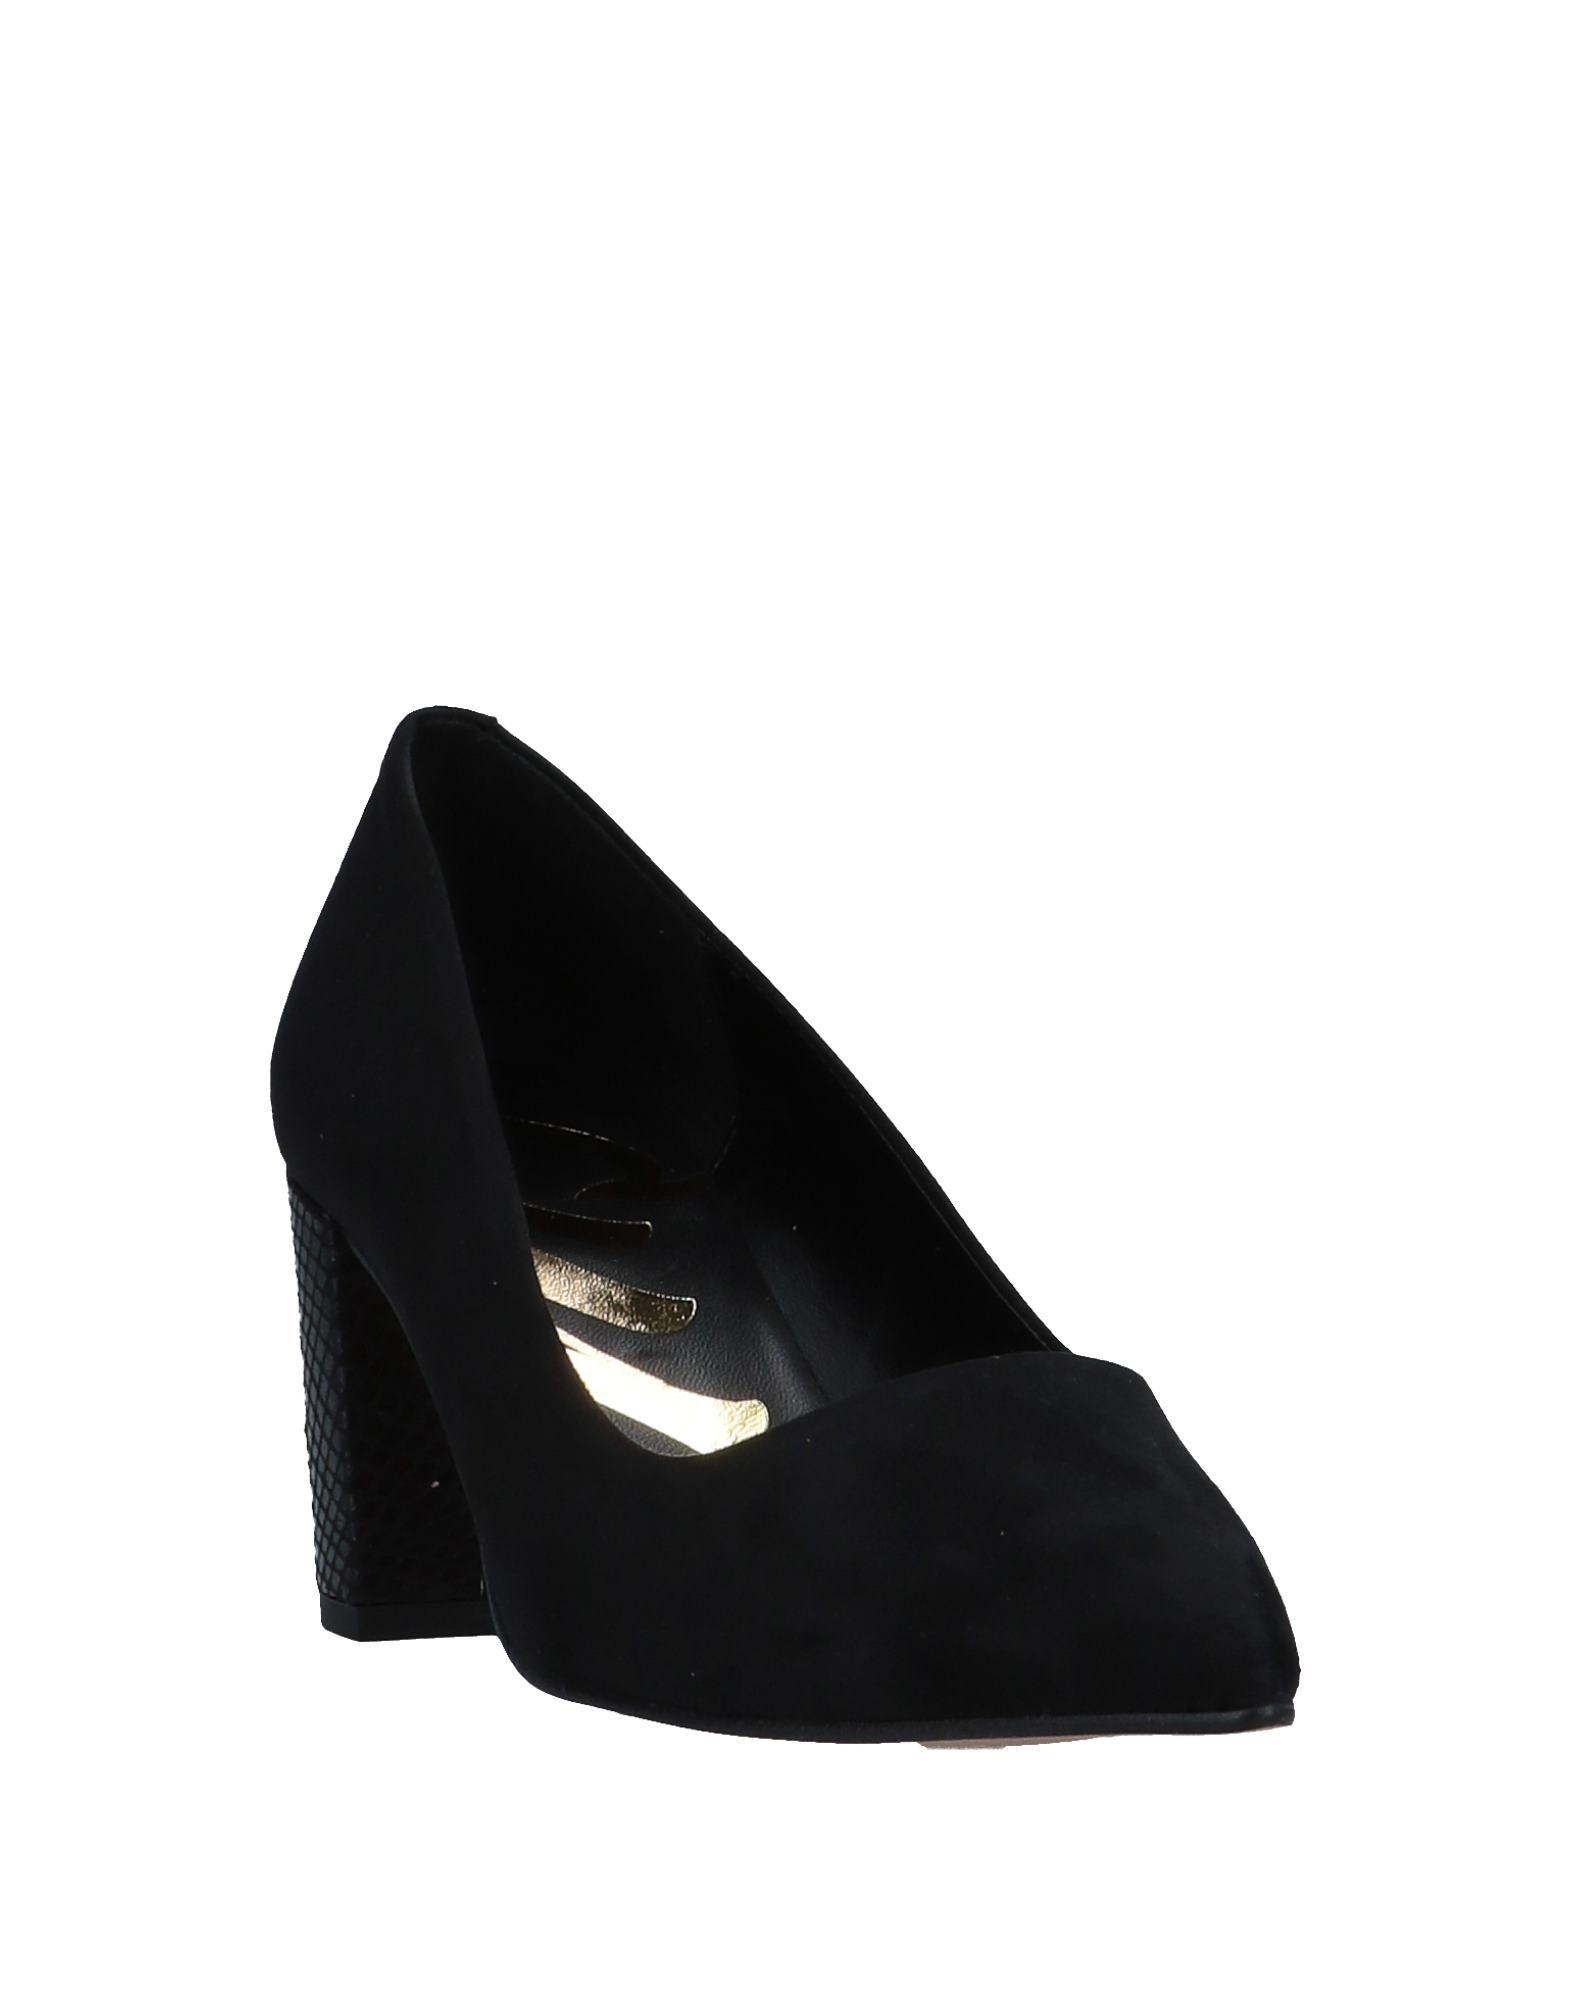 Cuplé Gute Pumps Damen  11543257HS Gute Cuplé Qualität beliebte Schuhe e84b12